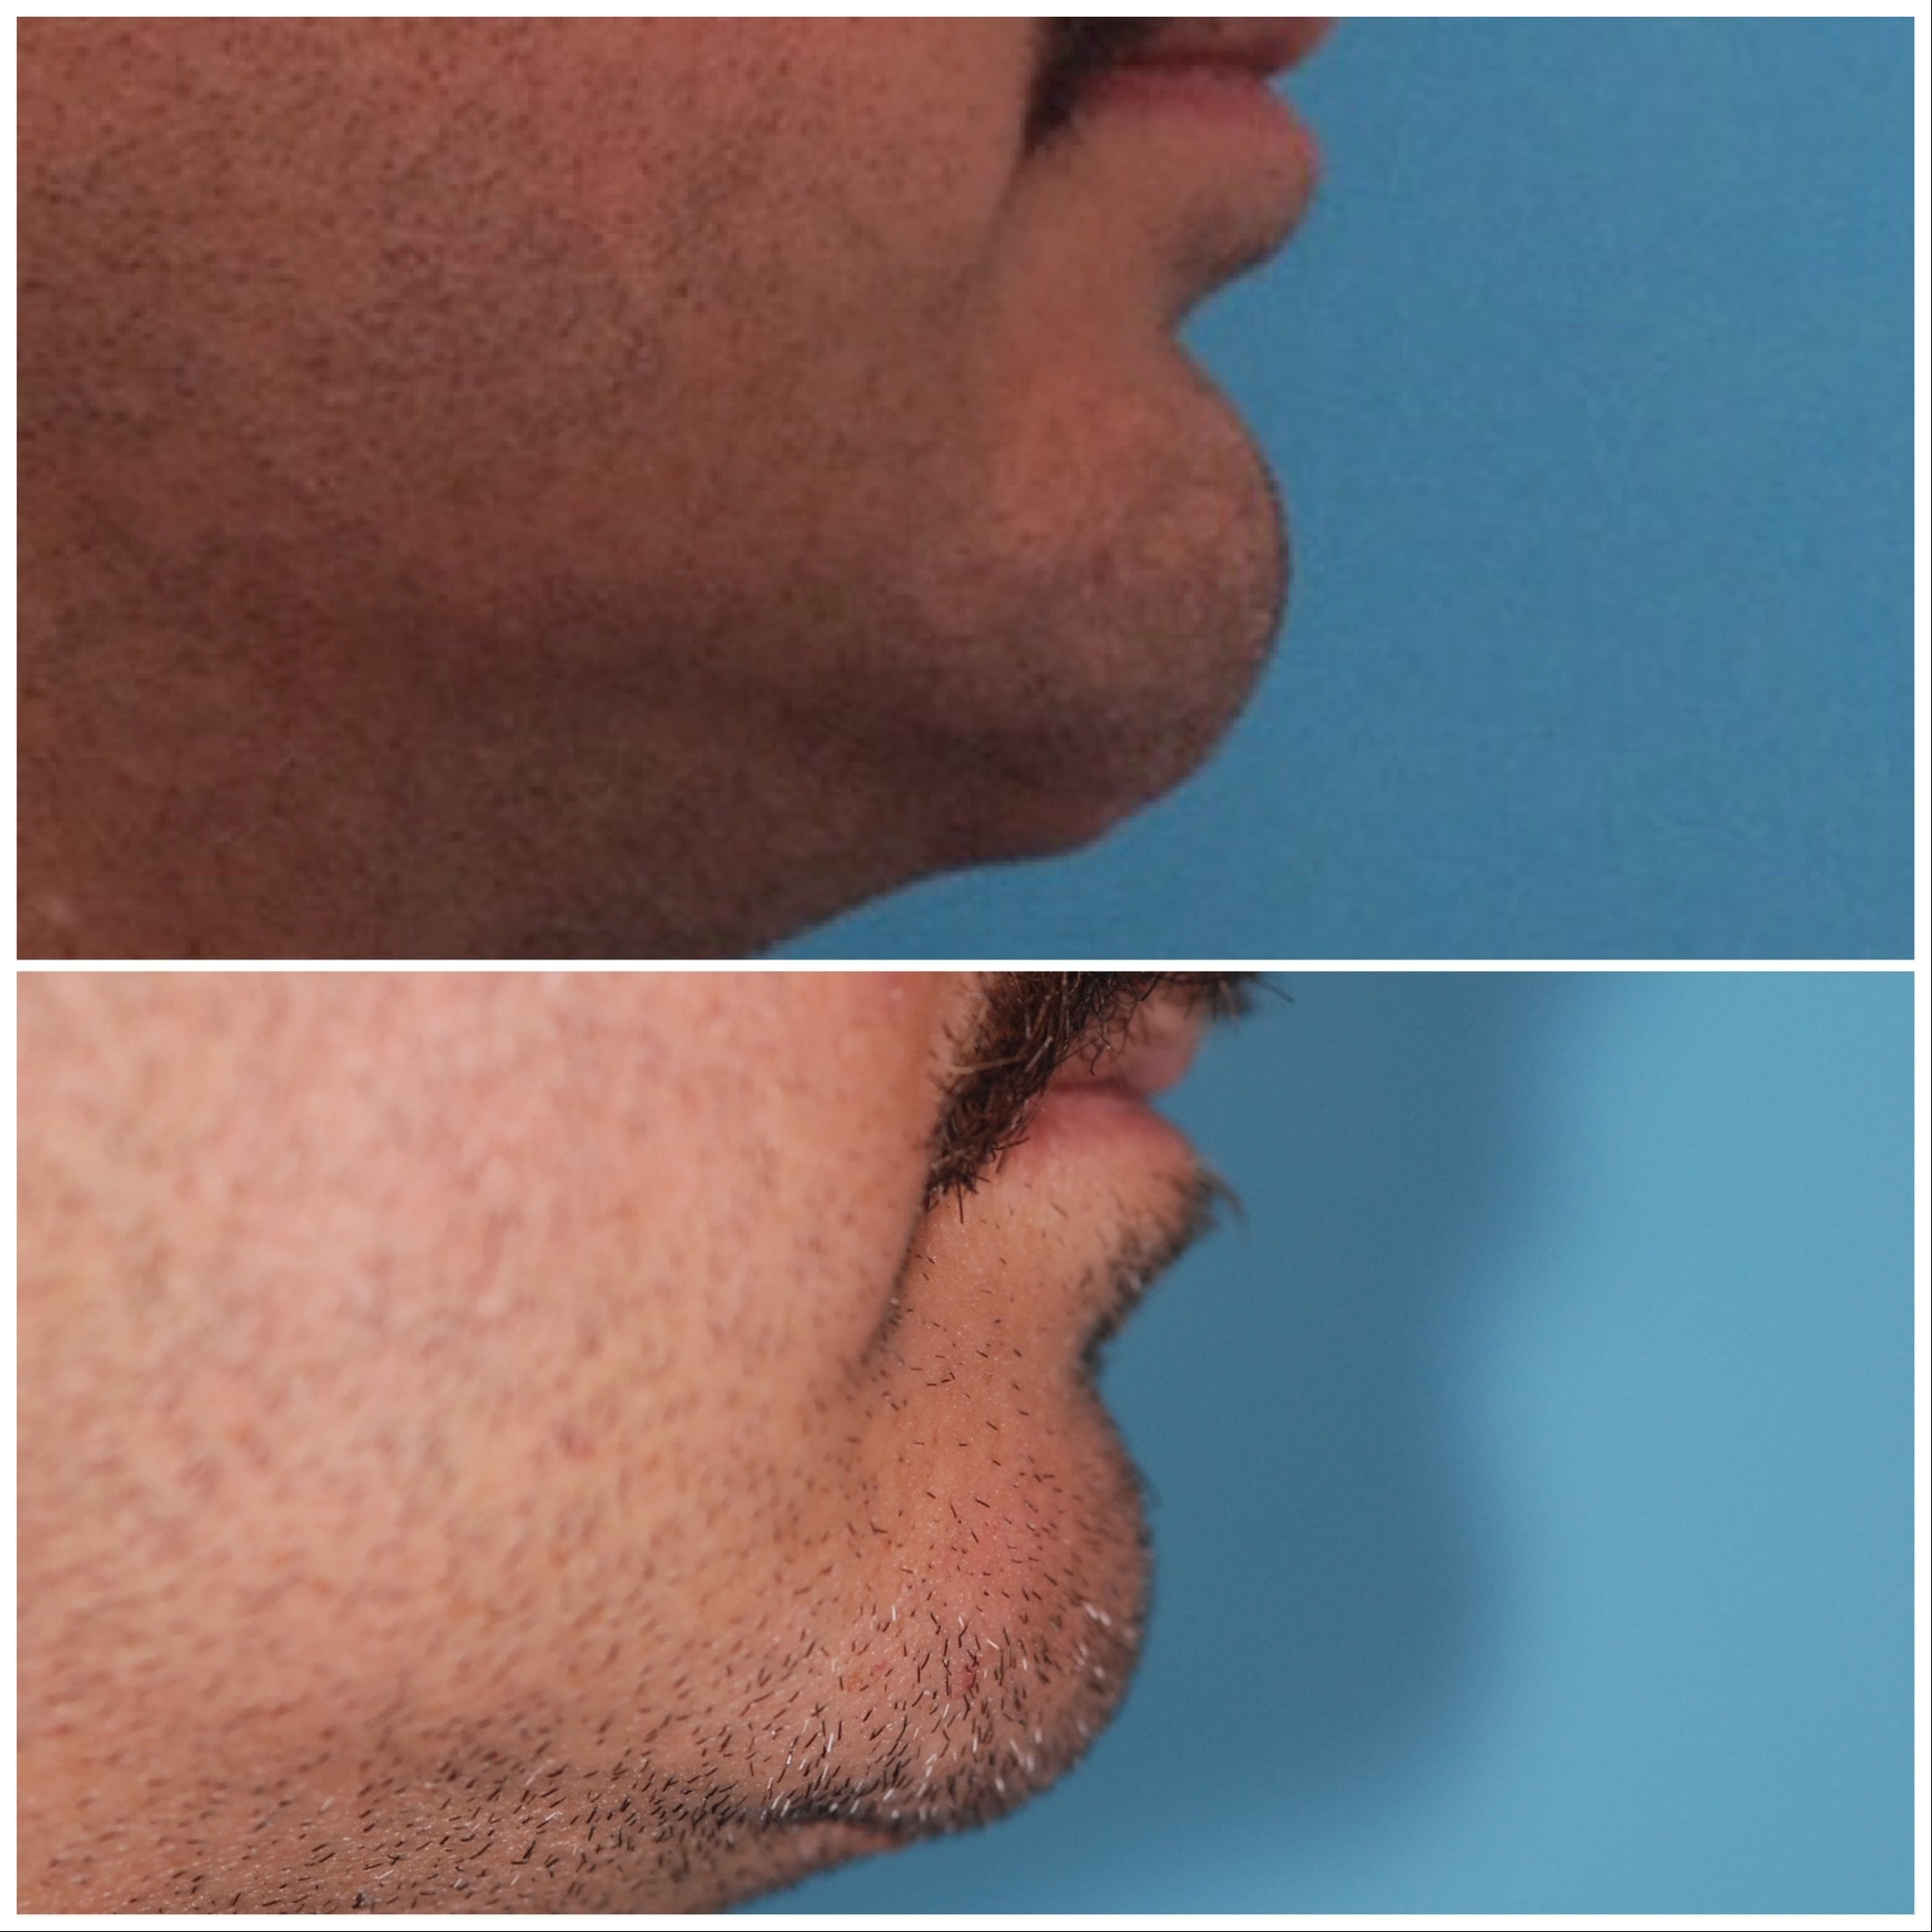 Implant Removal - Chin Advancement - Sliding Genioplasty